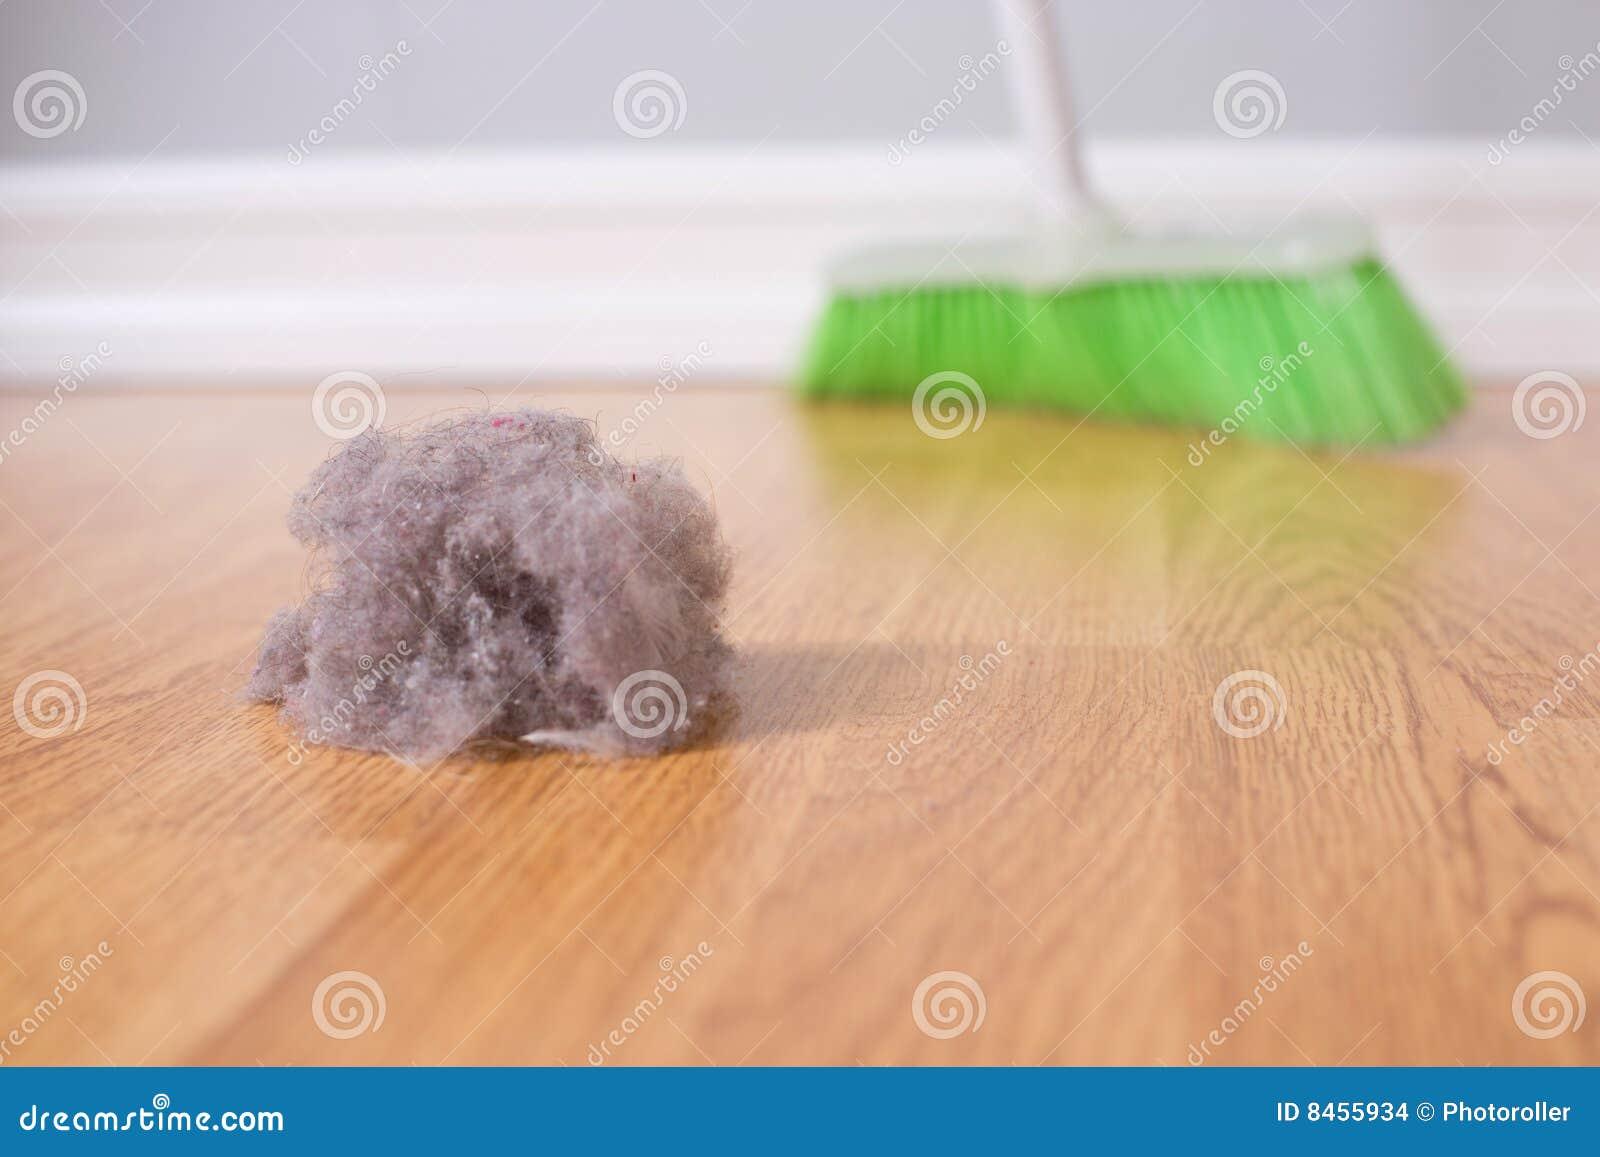 Cleaningfjäder